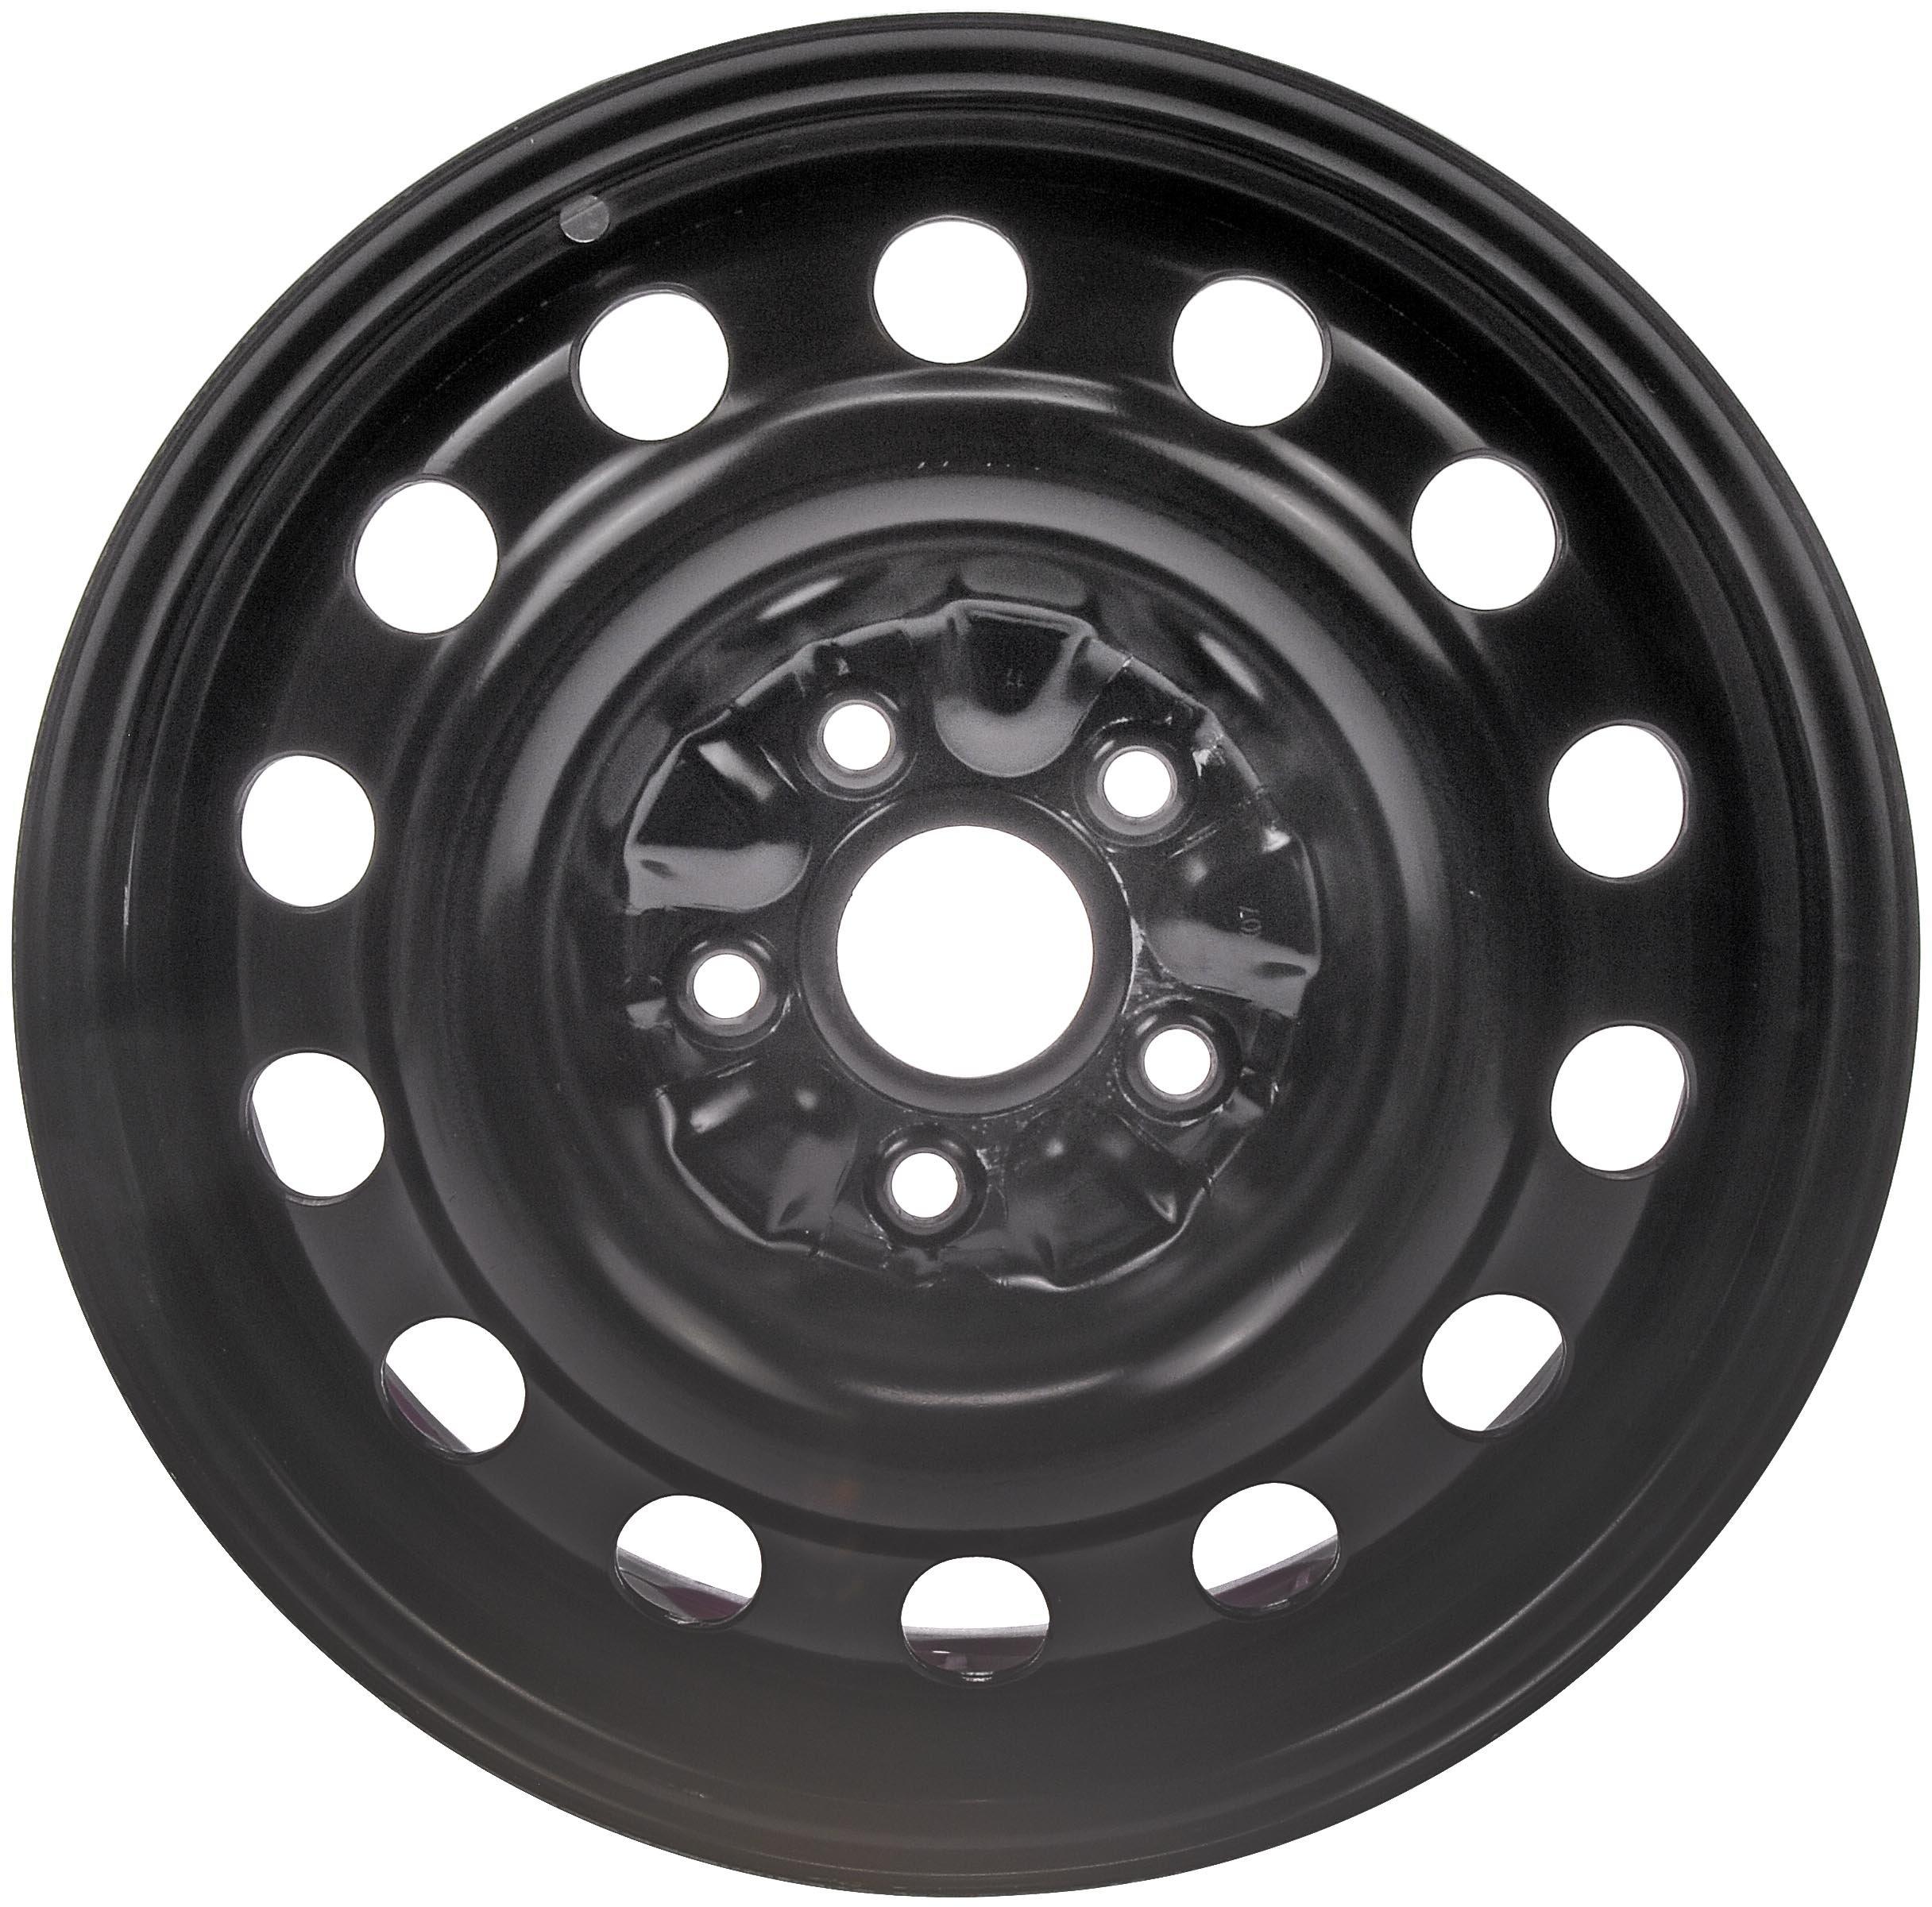 Dorman 939-121 Steel Wheel (16x6.5in.) for Select Toyota Models, Black